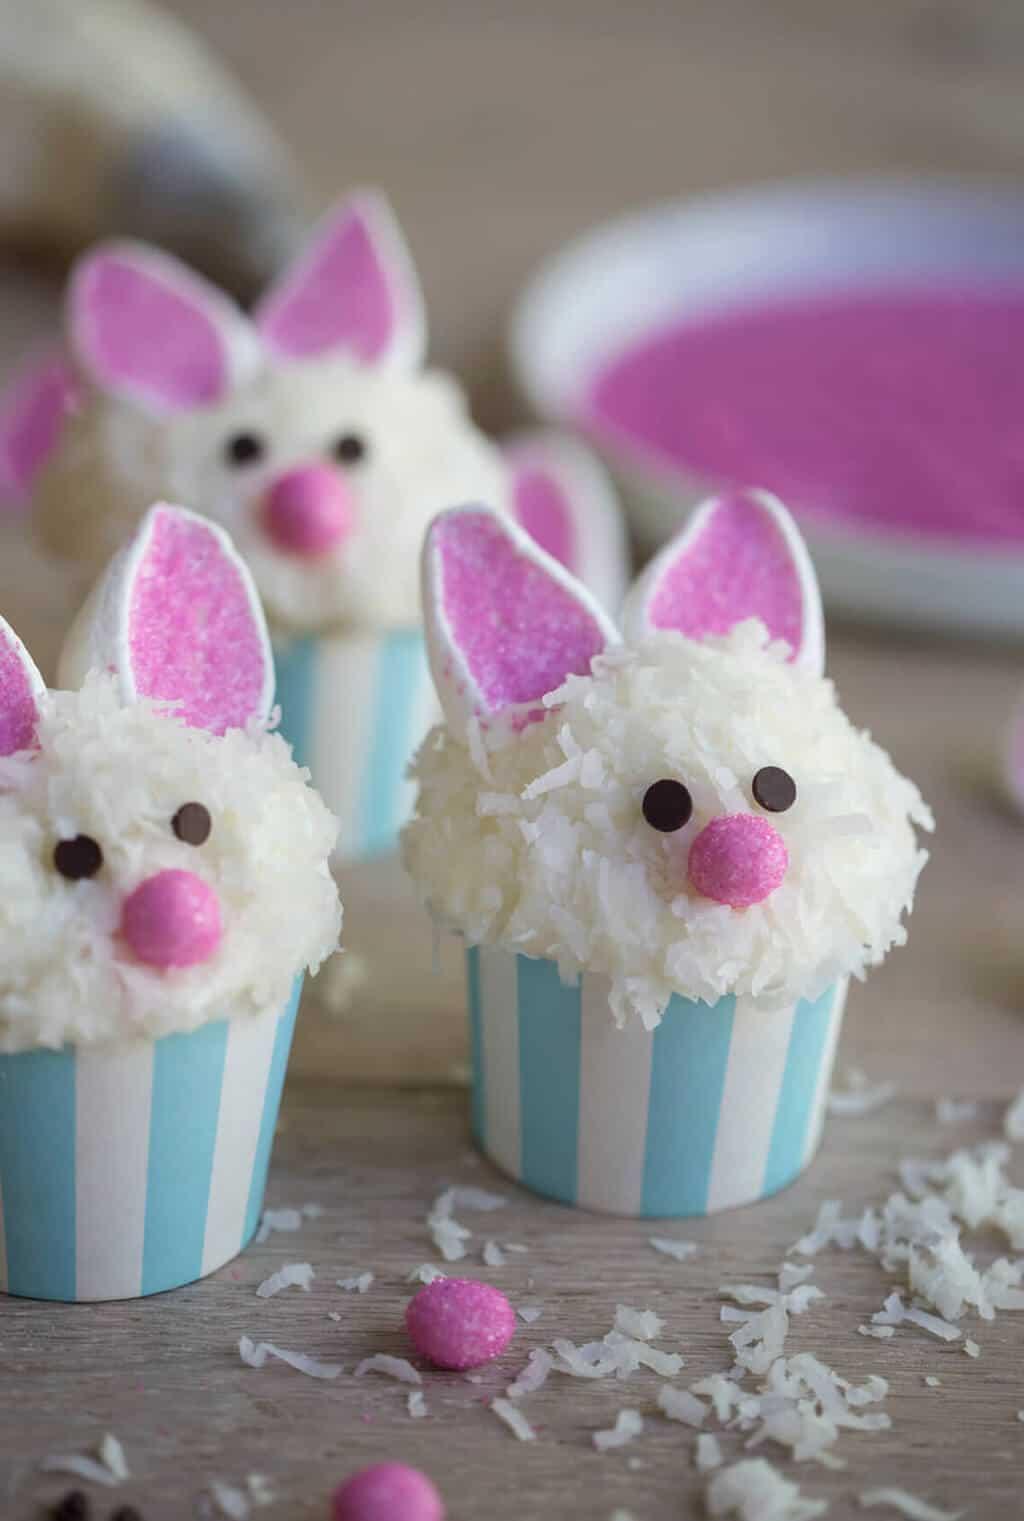 Bunny Cupcakes - Cute Easter Dessert Recipe